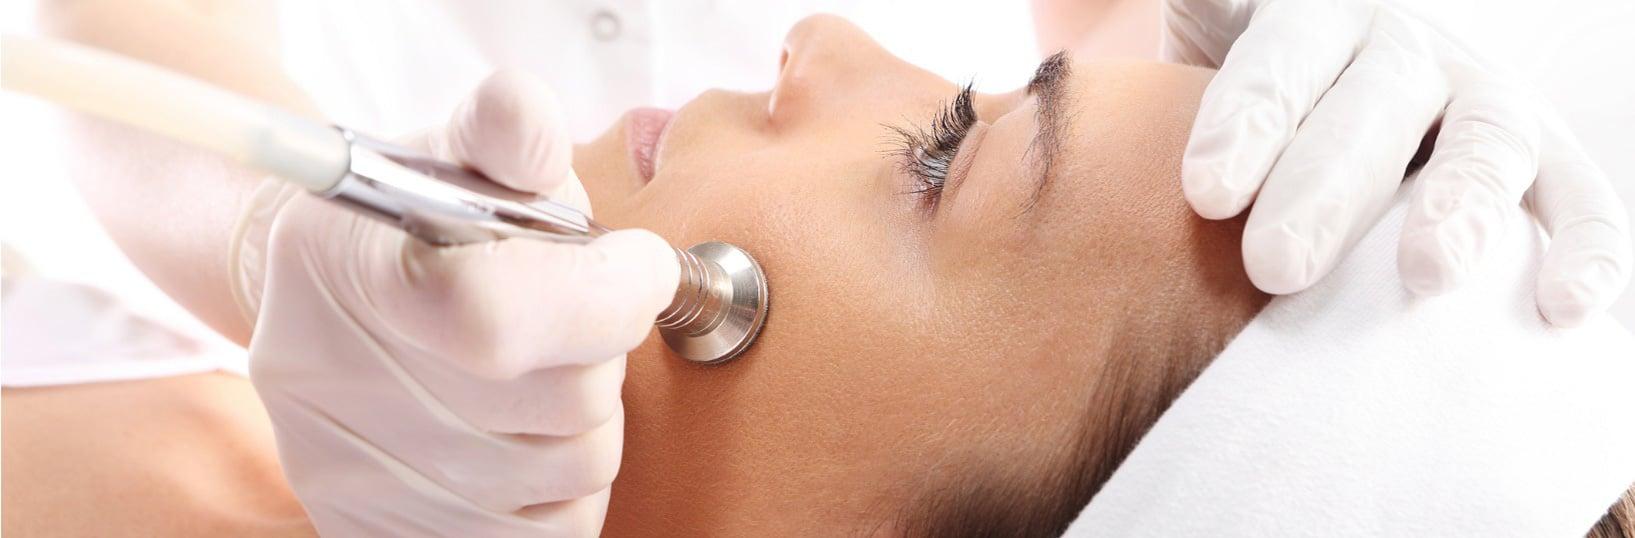 Diamond or Hydro Microdermabrasion facials